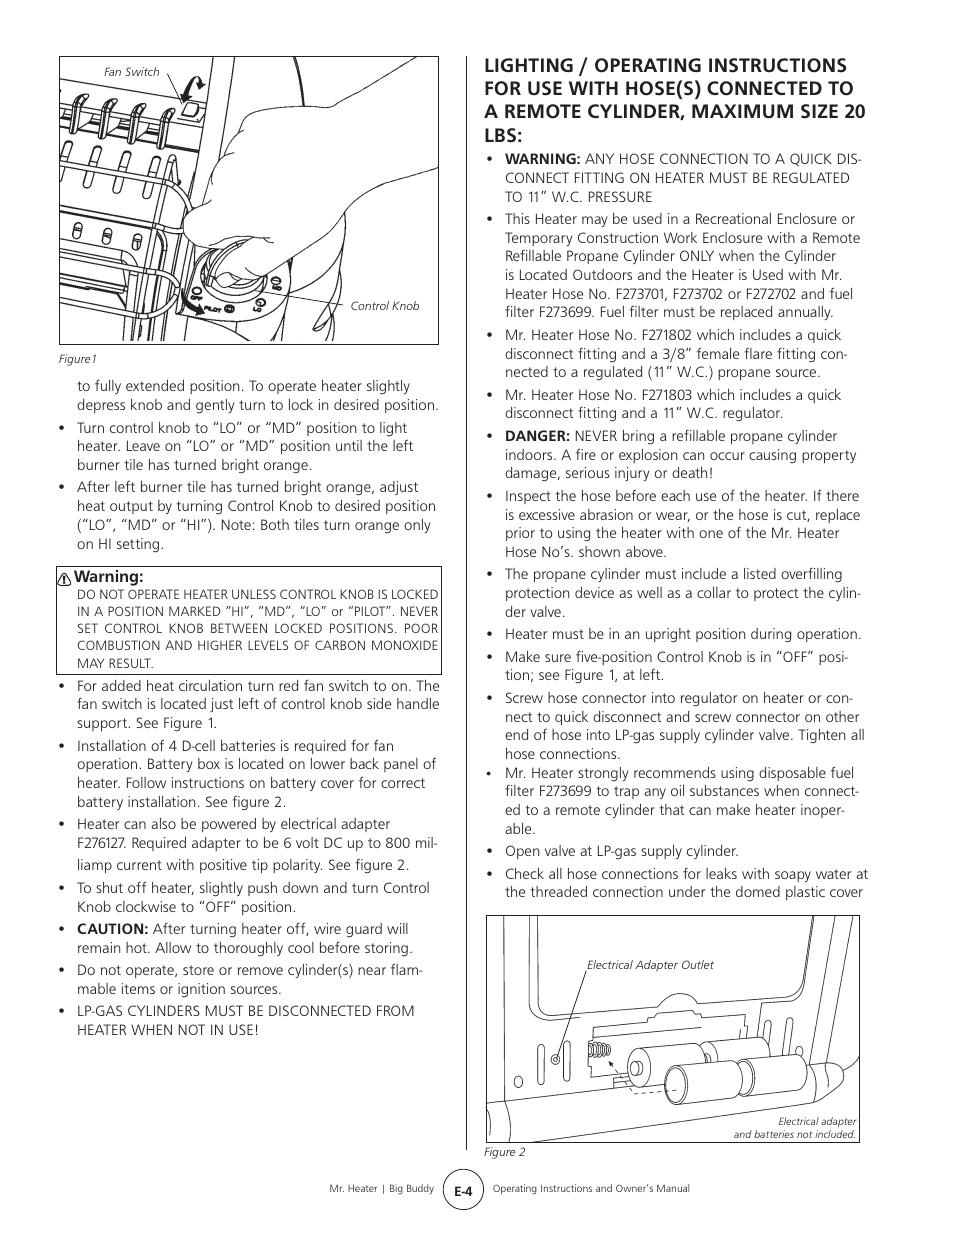 Mr Heater Big Buddy Mh188 User Manual Page 4 16